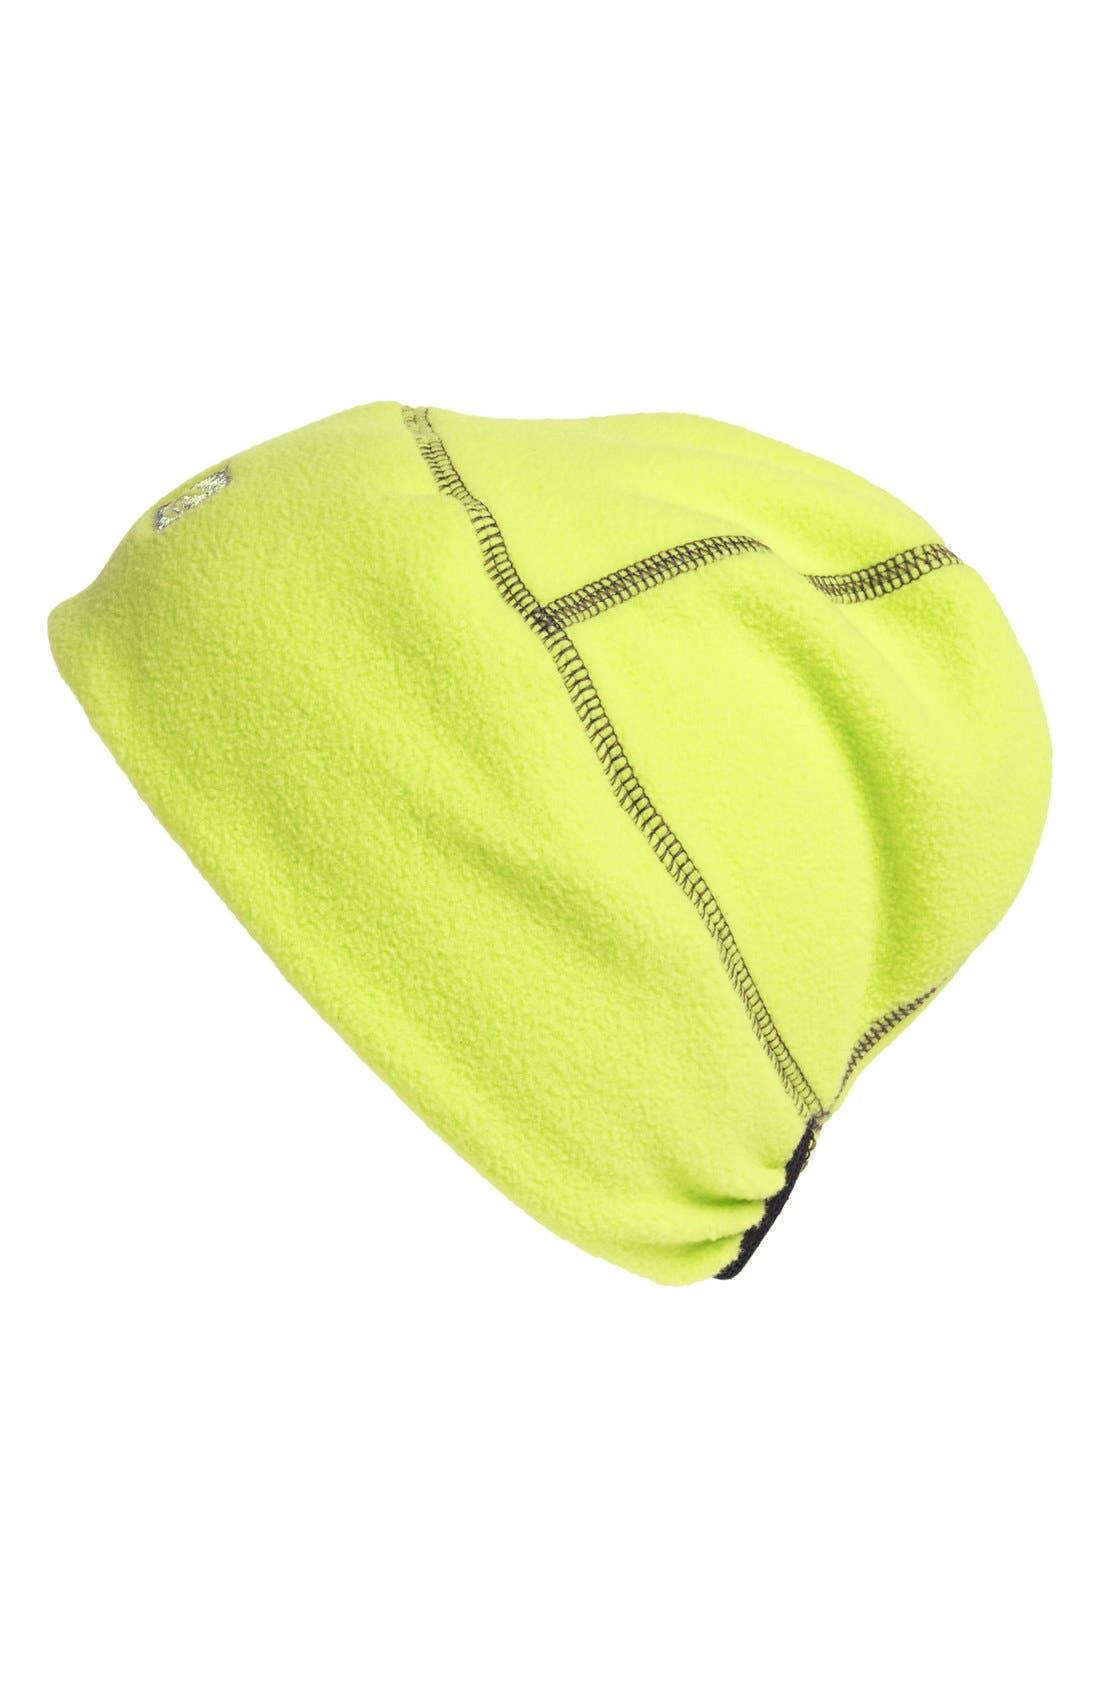 Alternate Image 1 Selected - Sperry Top-Sider® Fleece Beanie